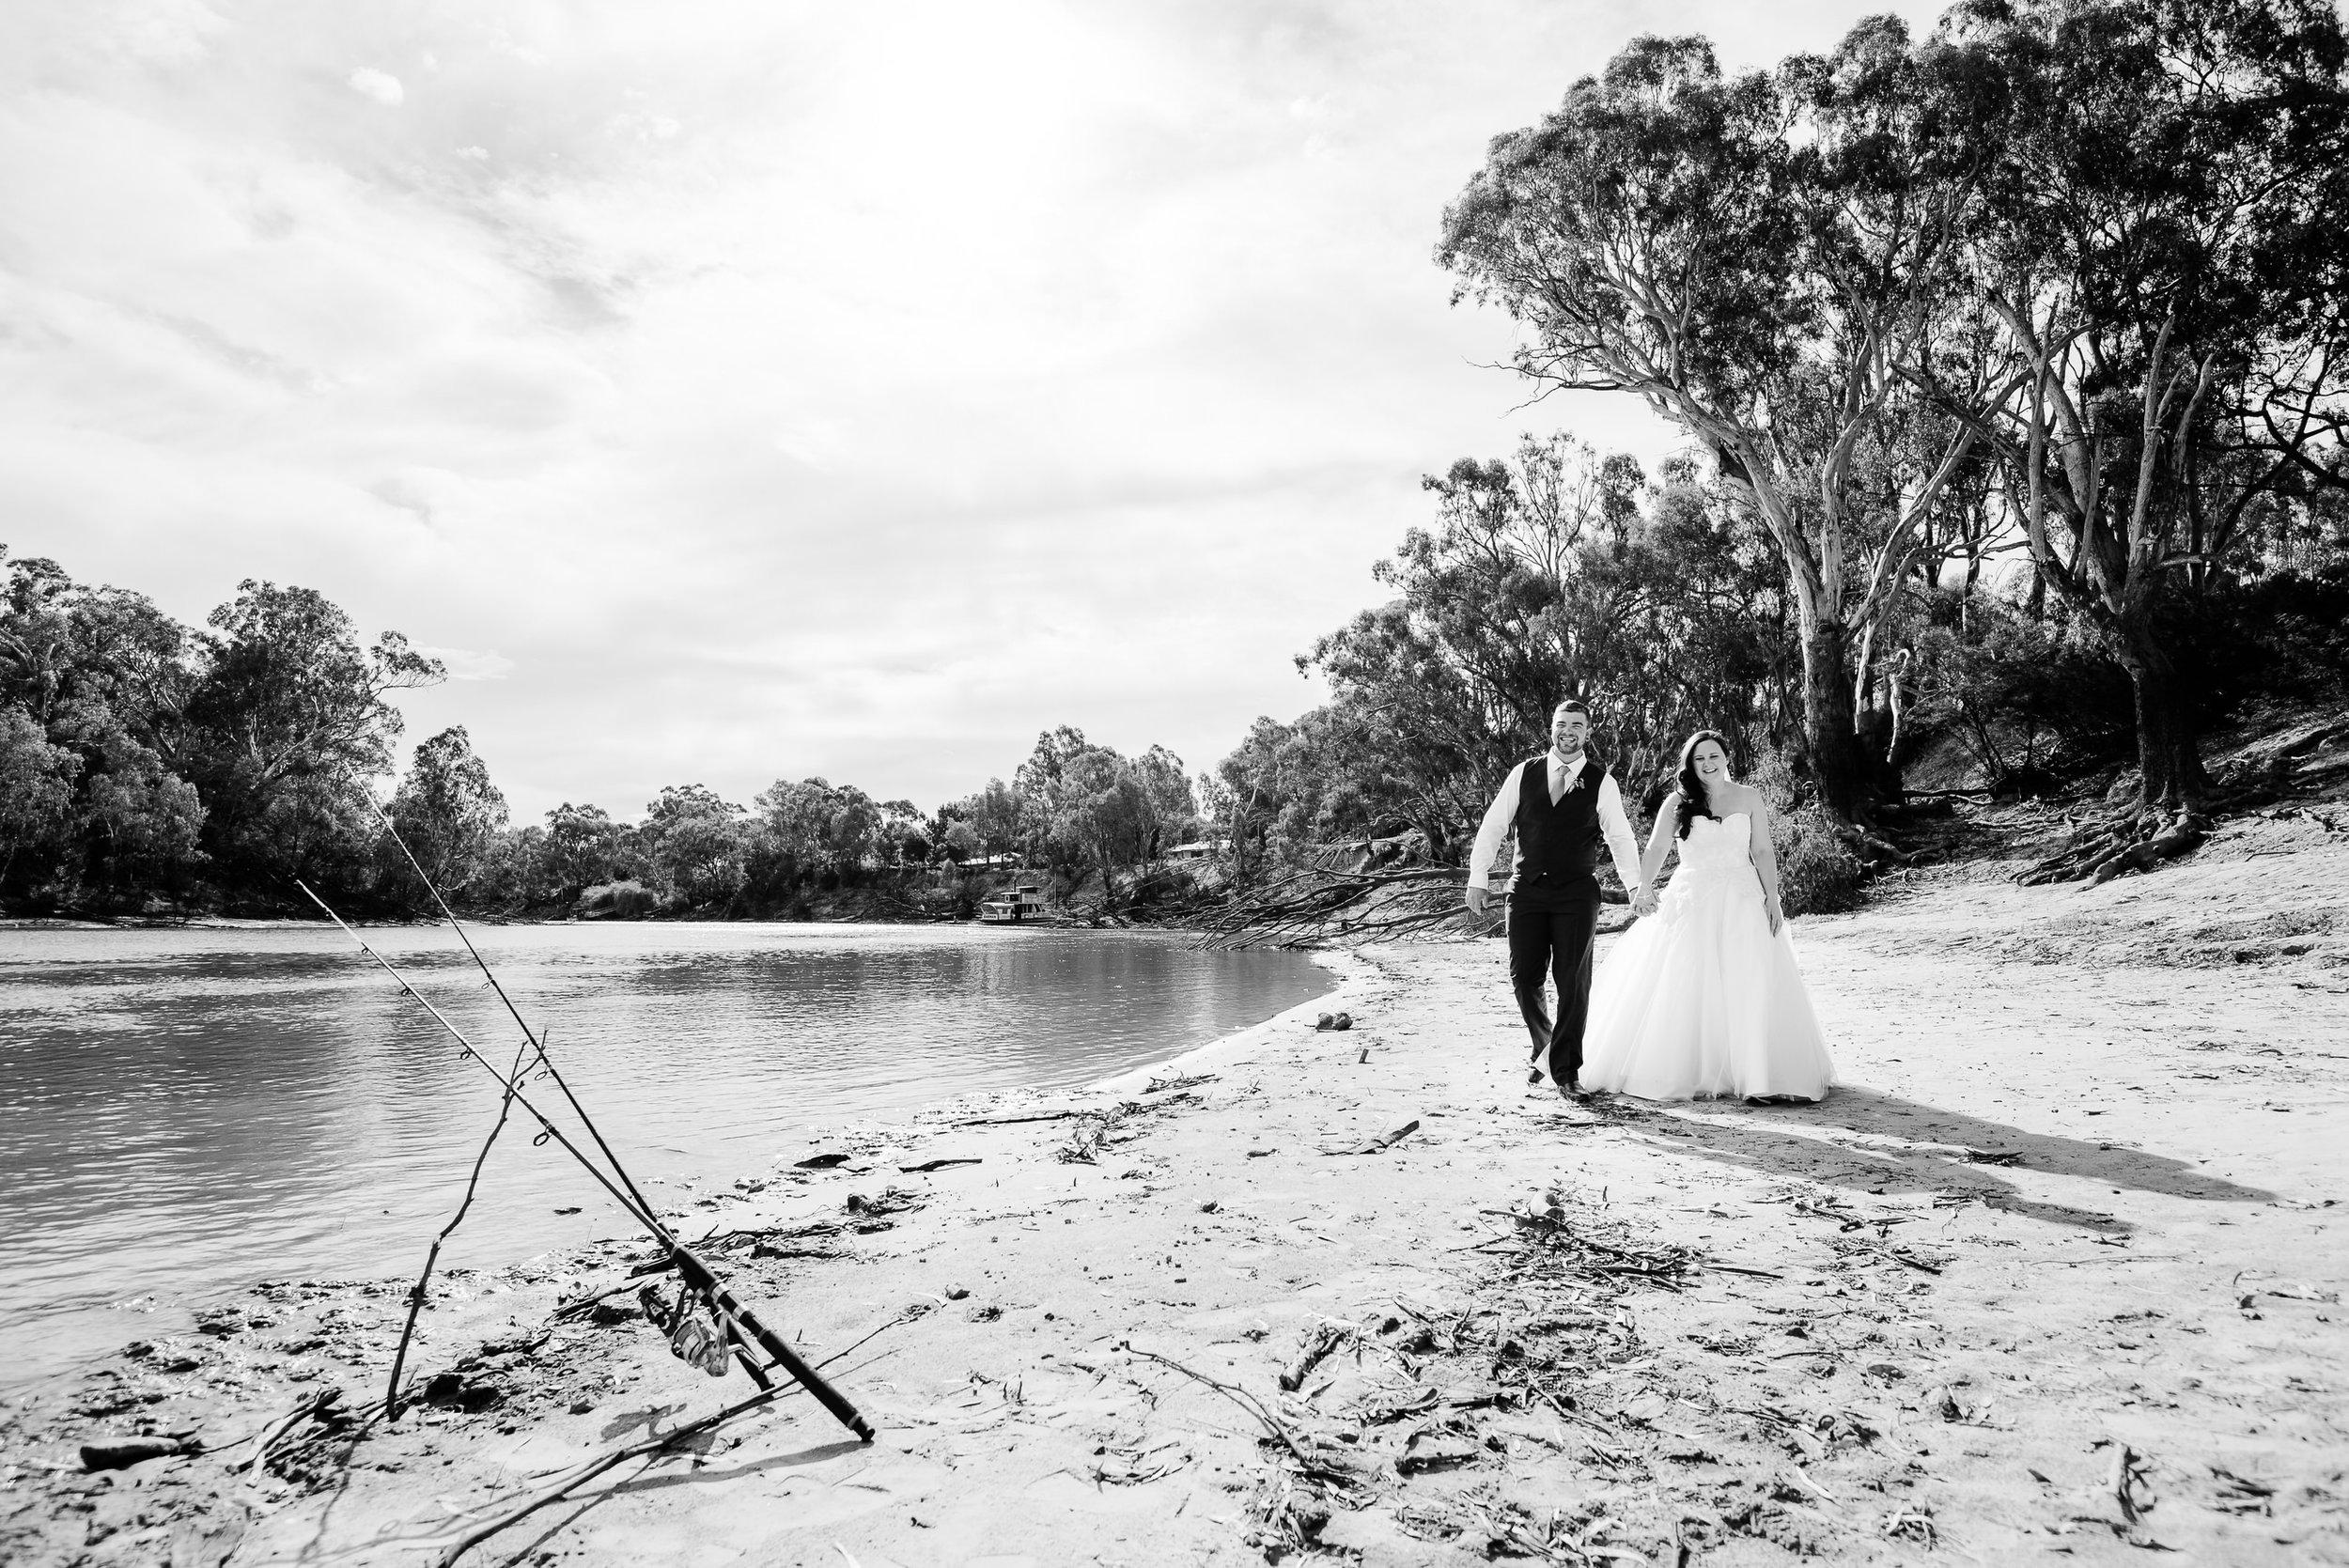 Justin_Jim_Echuca_Wedding_Photography_Tindarra-228.JPG